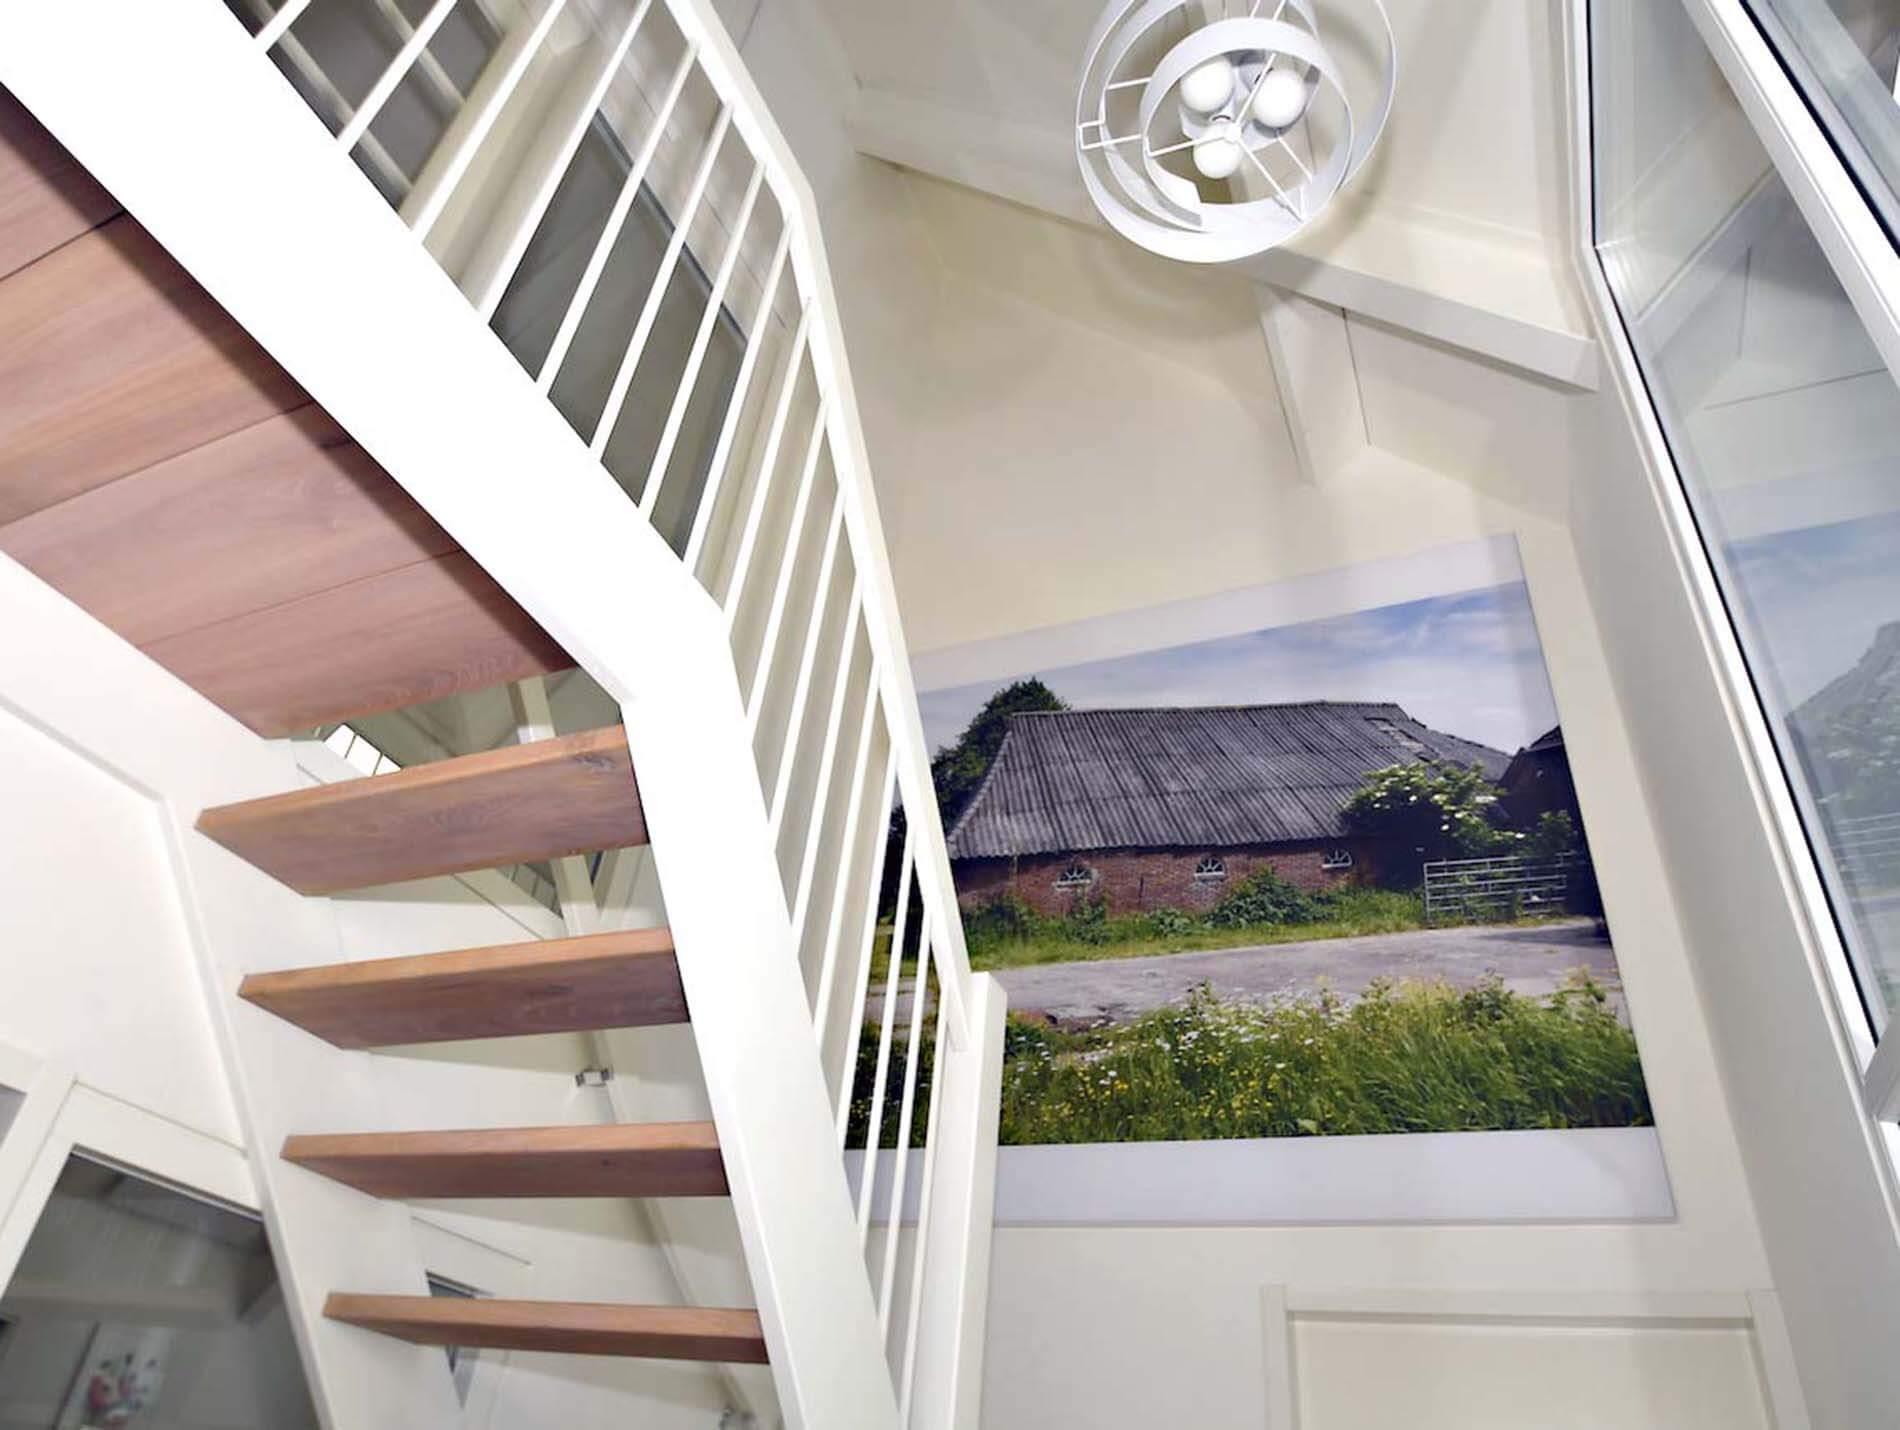 4. interieur-Wijnjewouden-particuliere-woning-1900x1430p.jpg